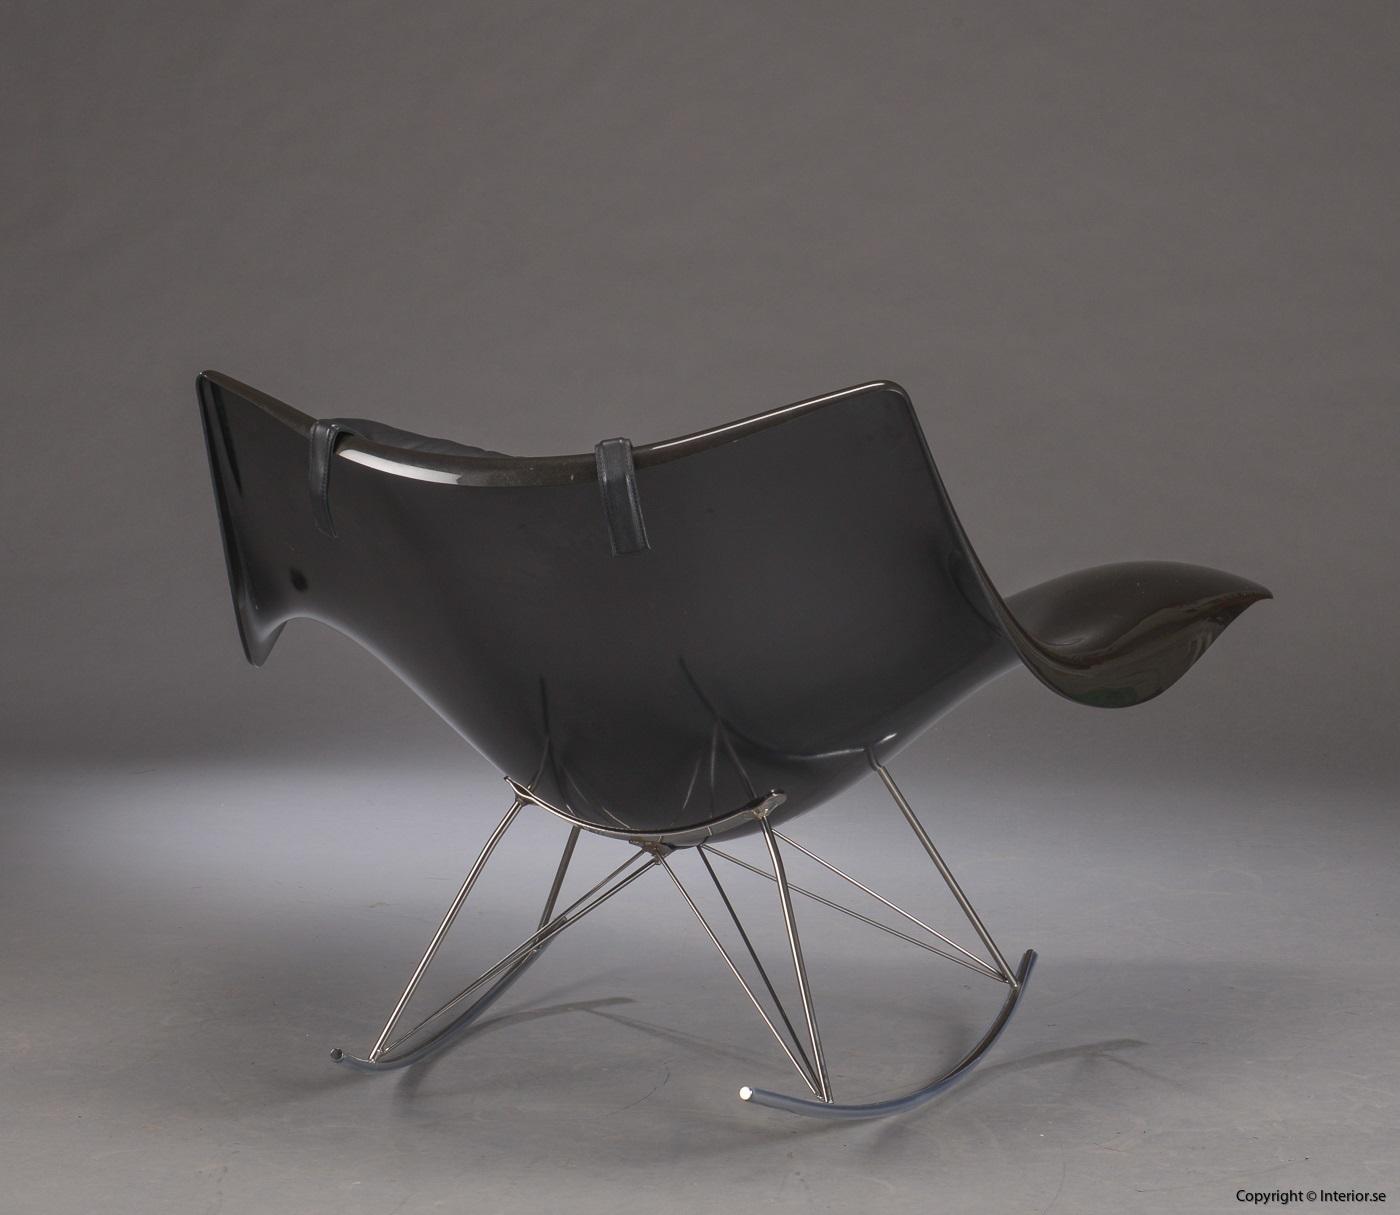 1 Gungstol, Fredericia Furniture Stingray - Thomas Pedersen Rocking chair, Schaukelstuhl (5)